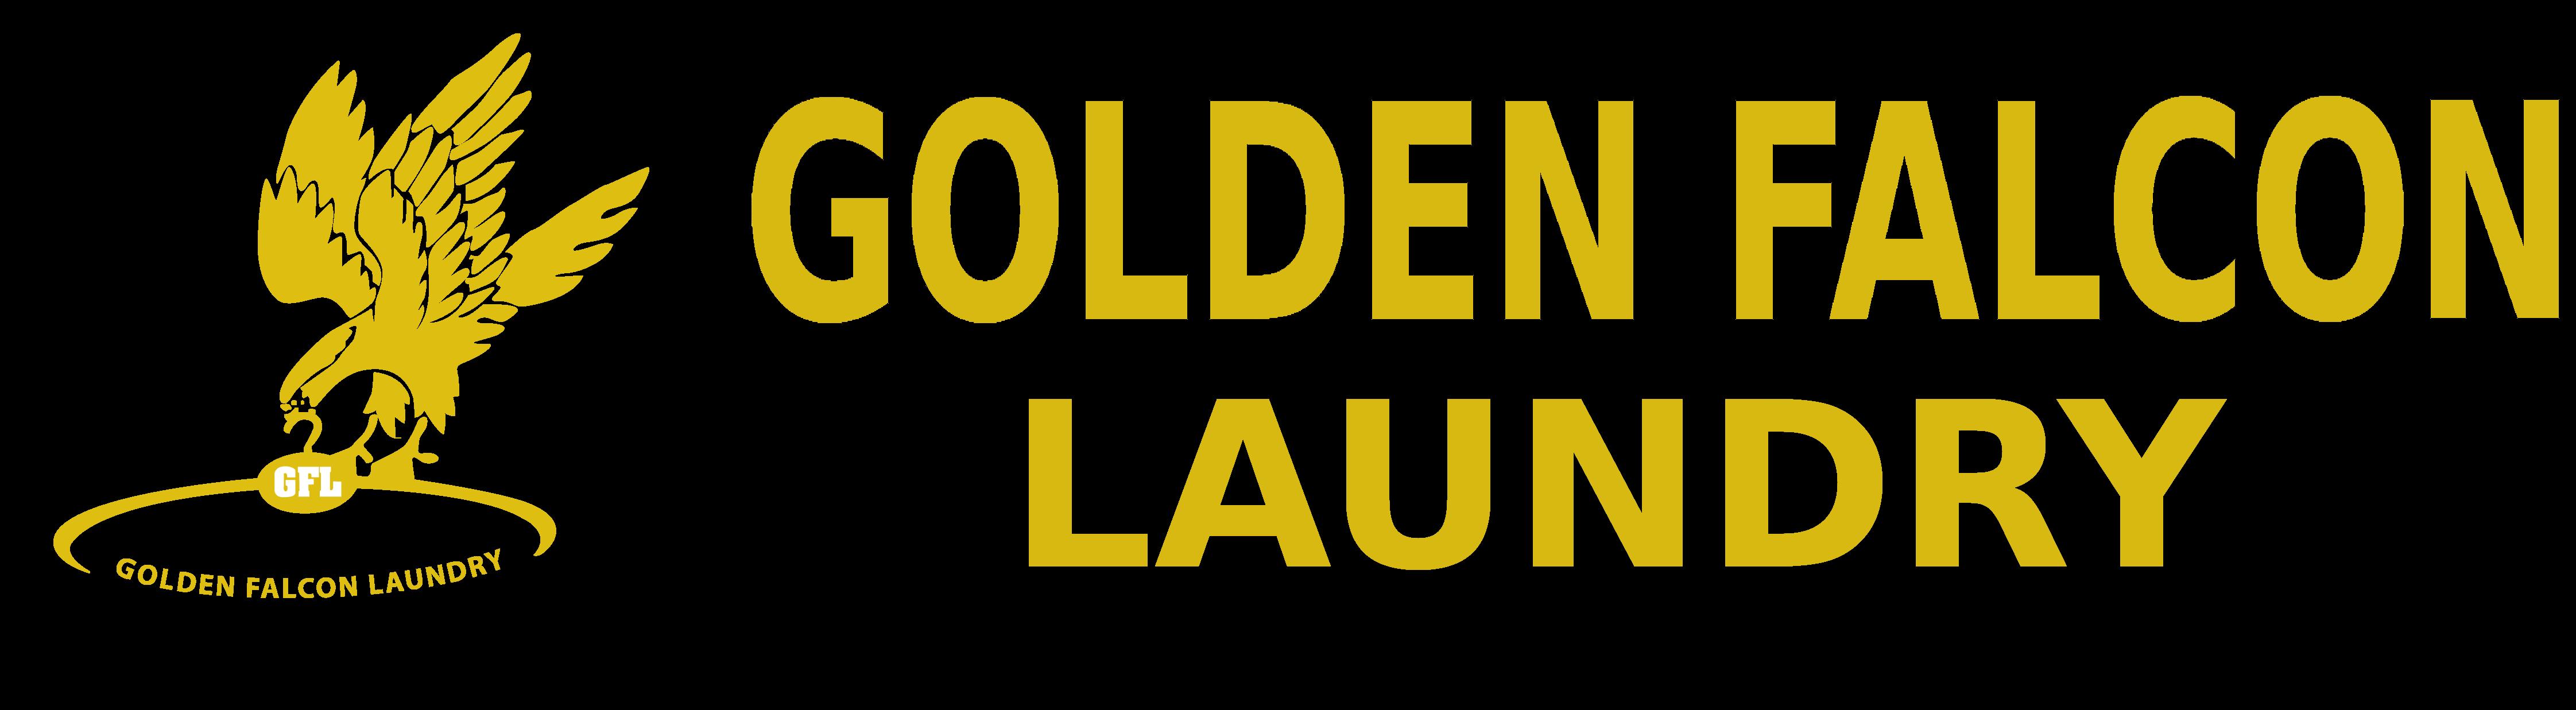 Golden Falcon Laundry, Dubai  – Dubai Laundry Services with pick-up